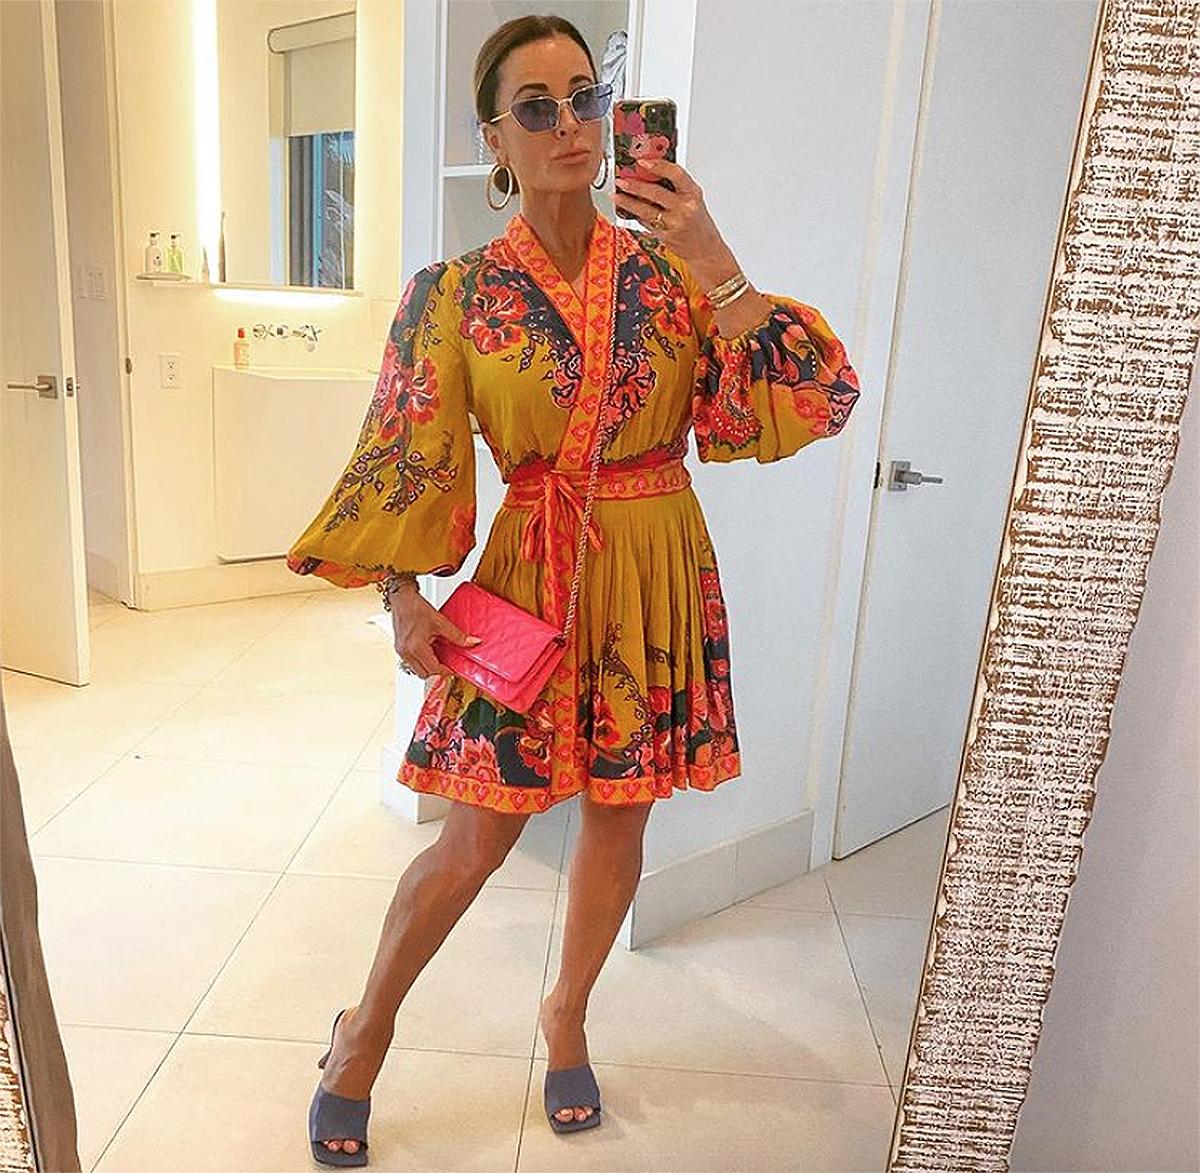 kyle-richards-island-vibes-dress